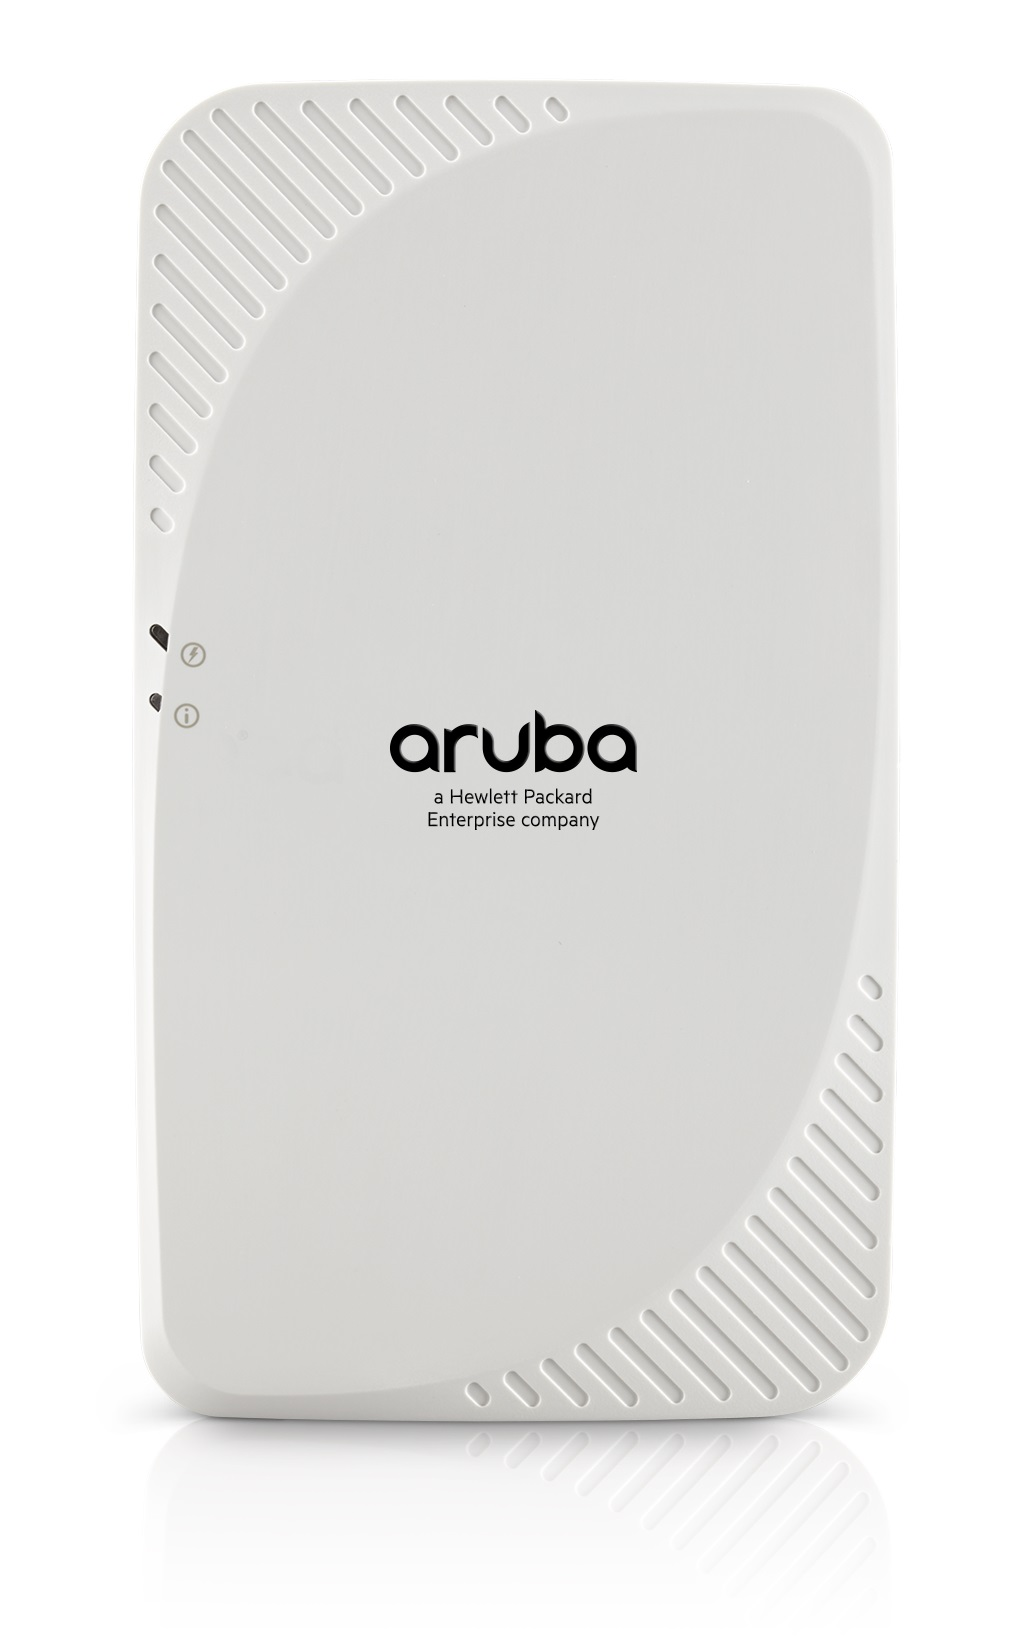 Aruba IAP-205H Wireless AP - Hospitality